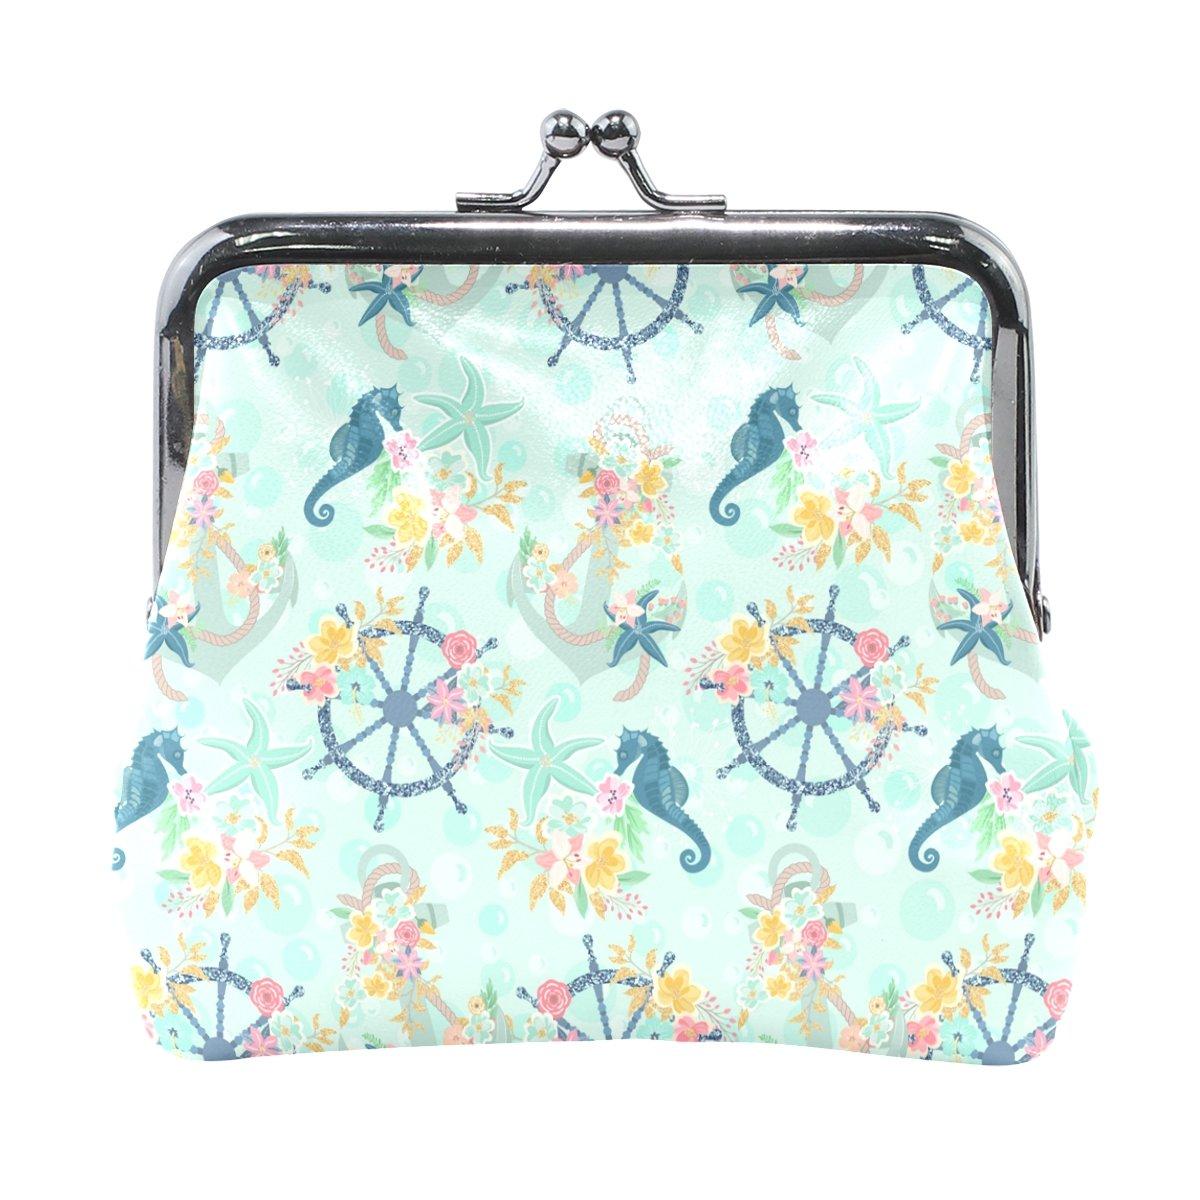 Sunlome Nautical Anchor Starfish Sea Horse Floral Coin Purse Change Cash Bag Small Purse Wallets for Women Girl